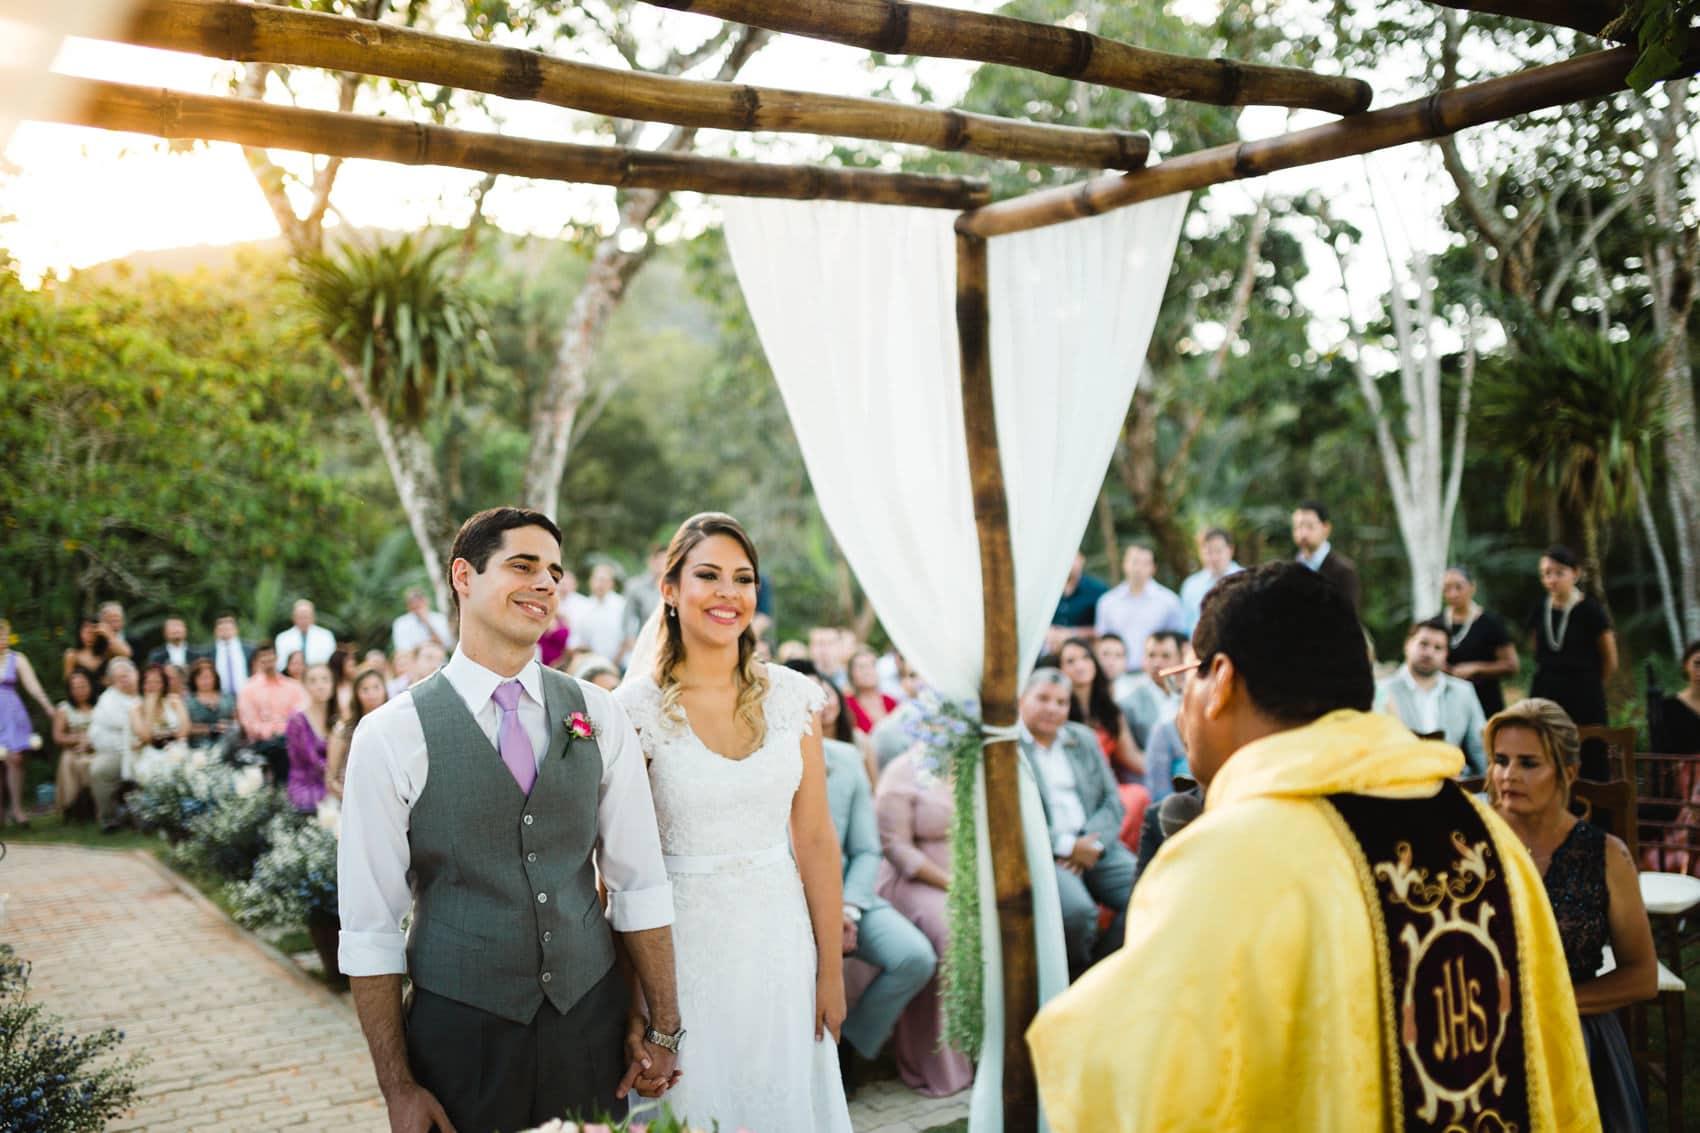 casamento-sitio-serra-guaramiranga-35